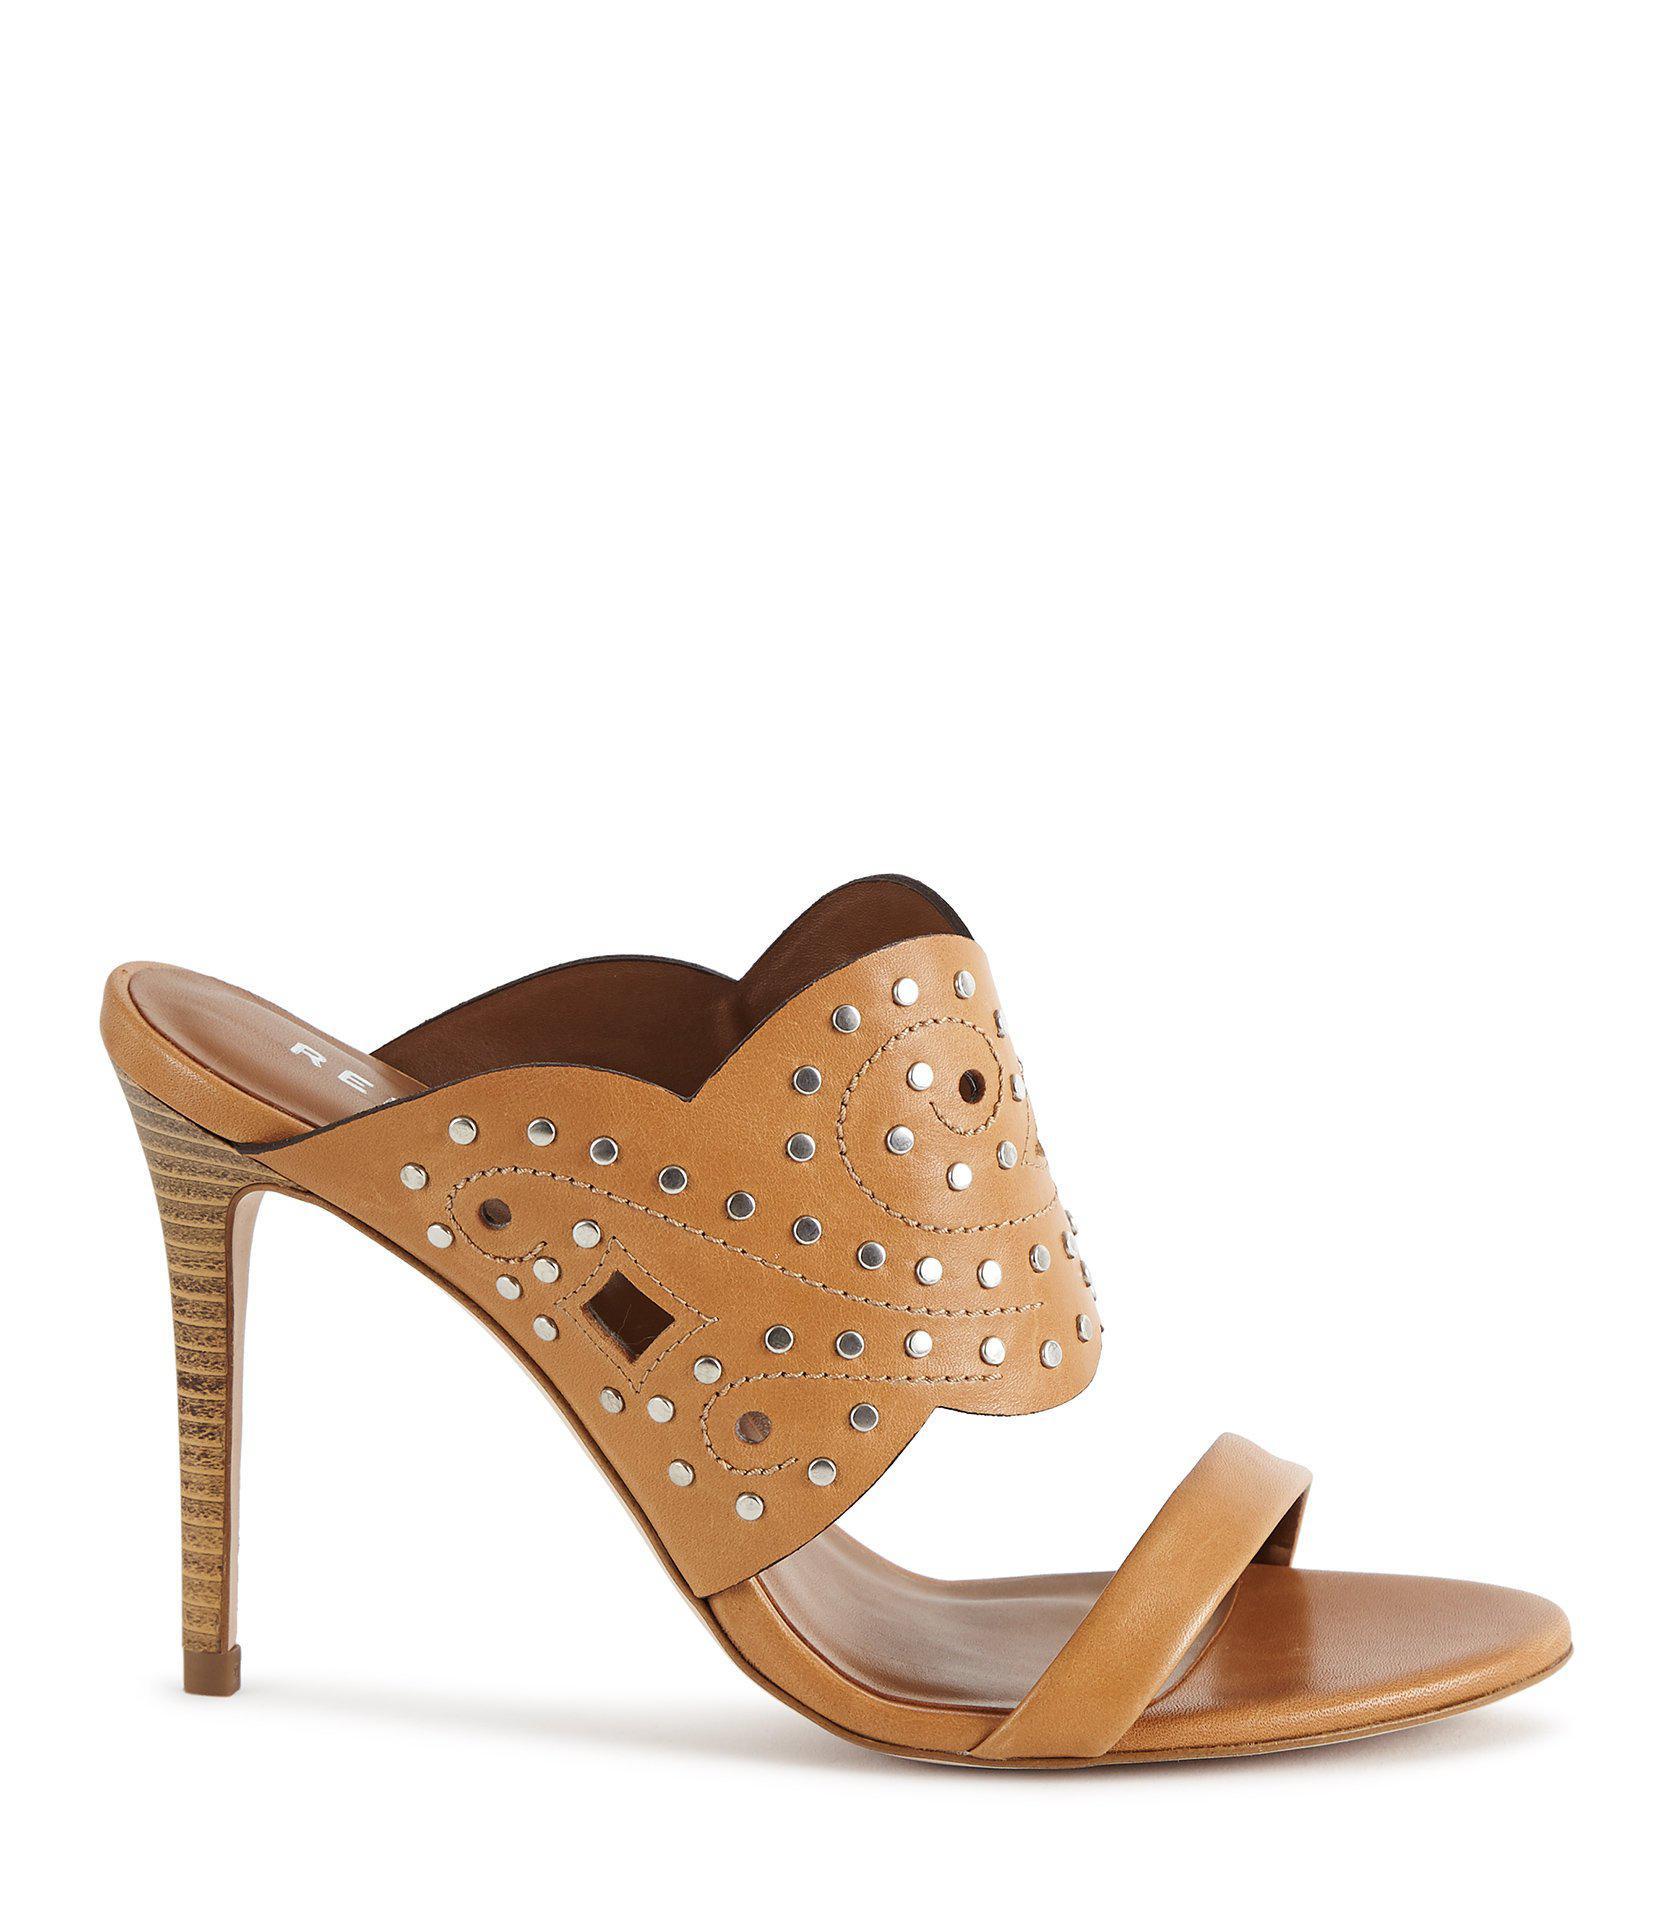 Reiss Women's Lasa Studded High Heel Leather Slide Sandals jIScvwOXk3